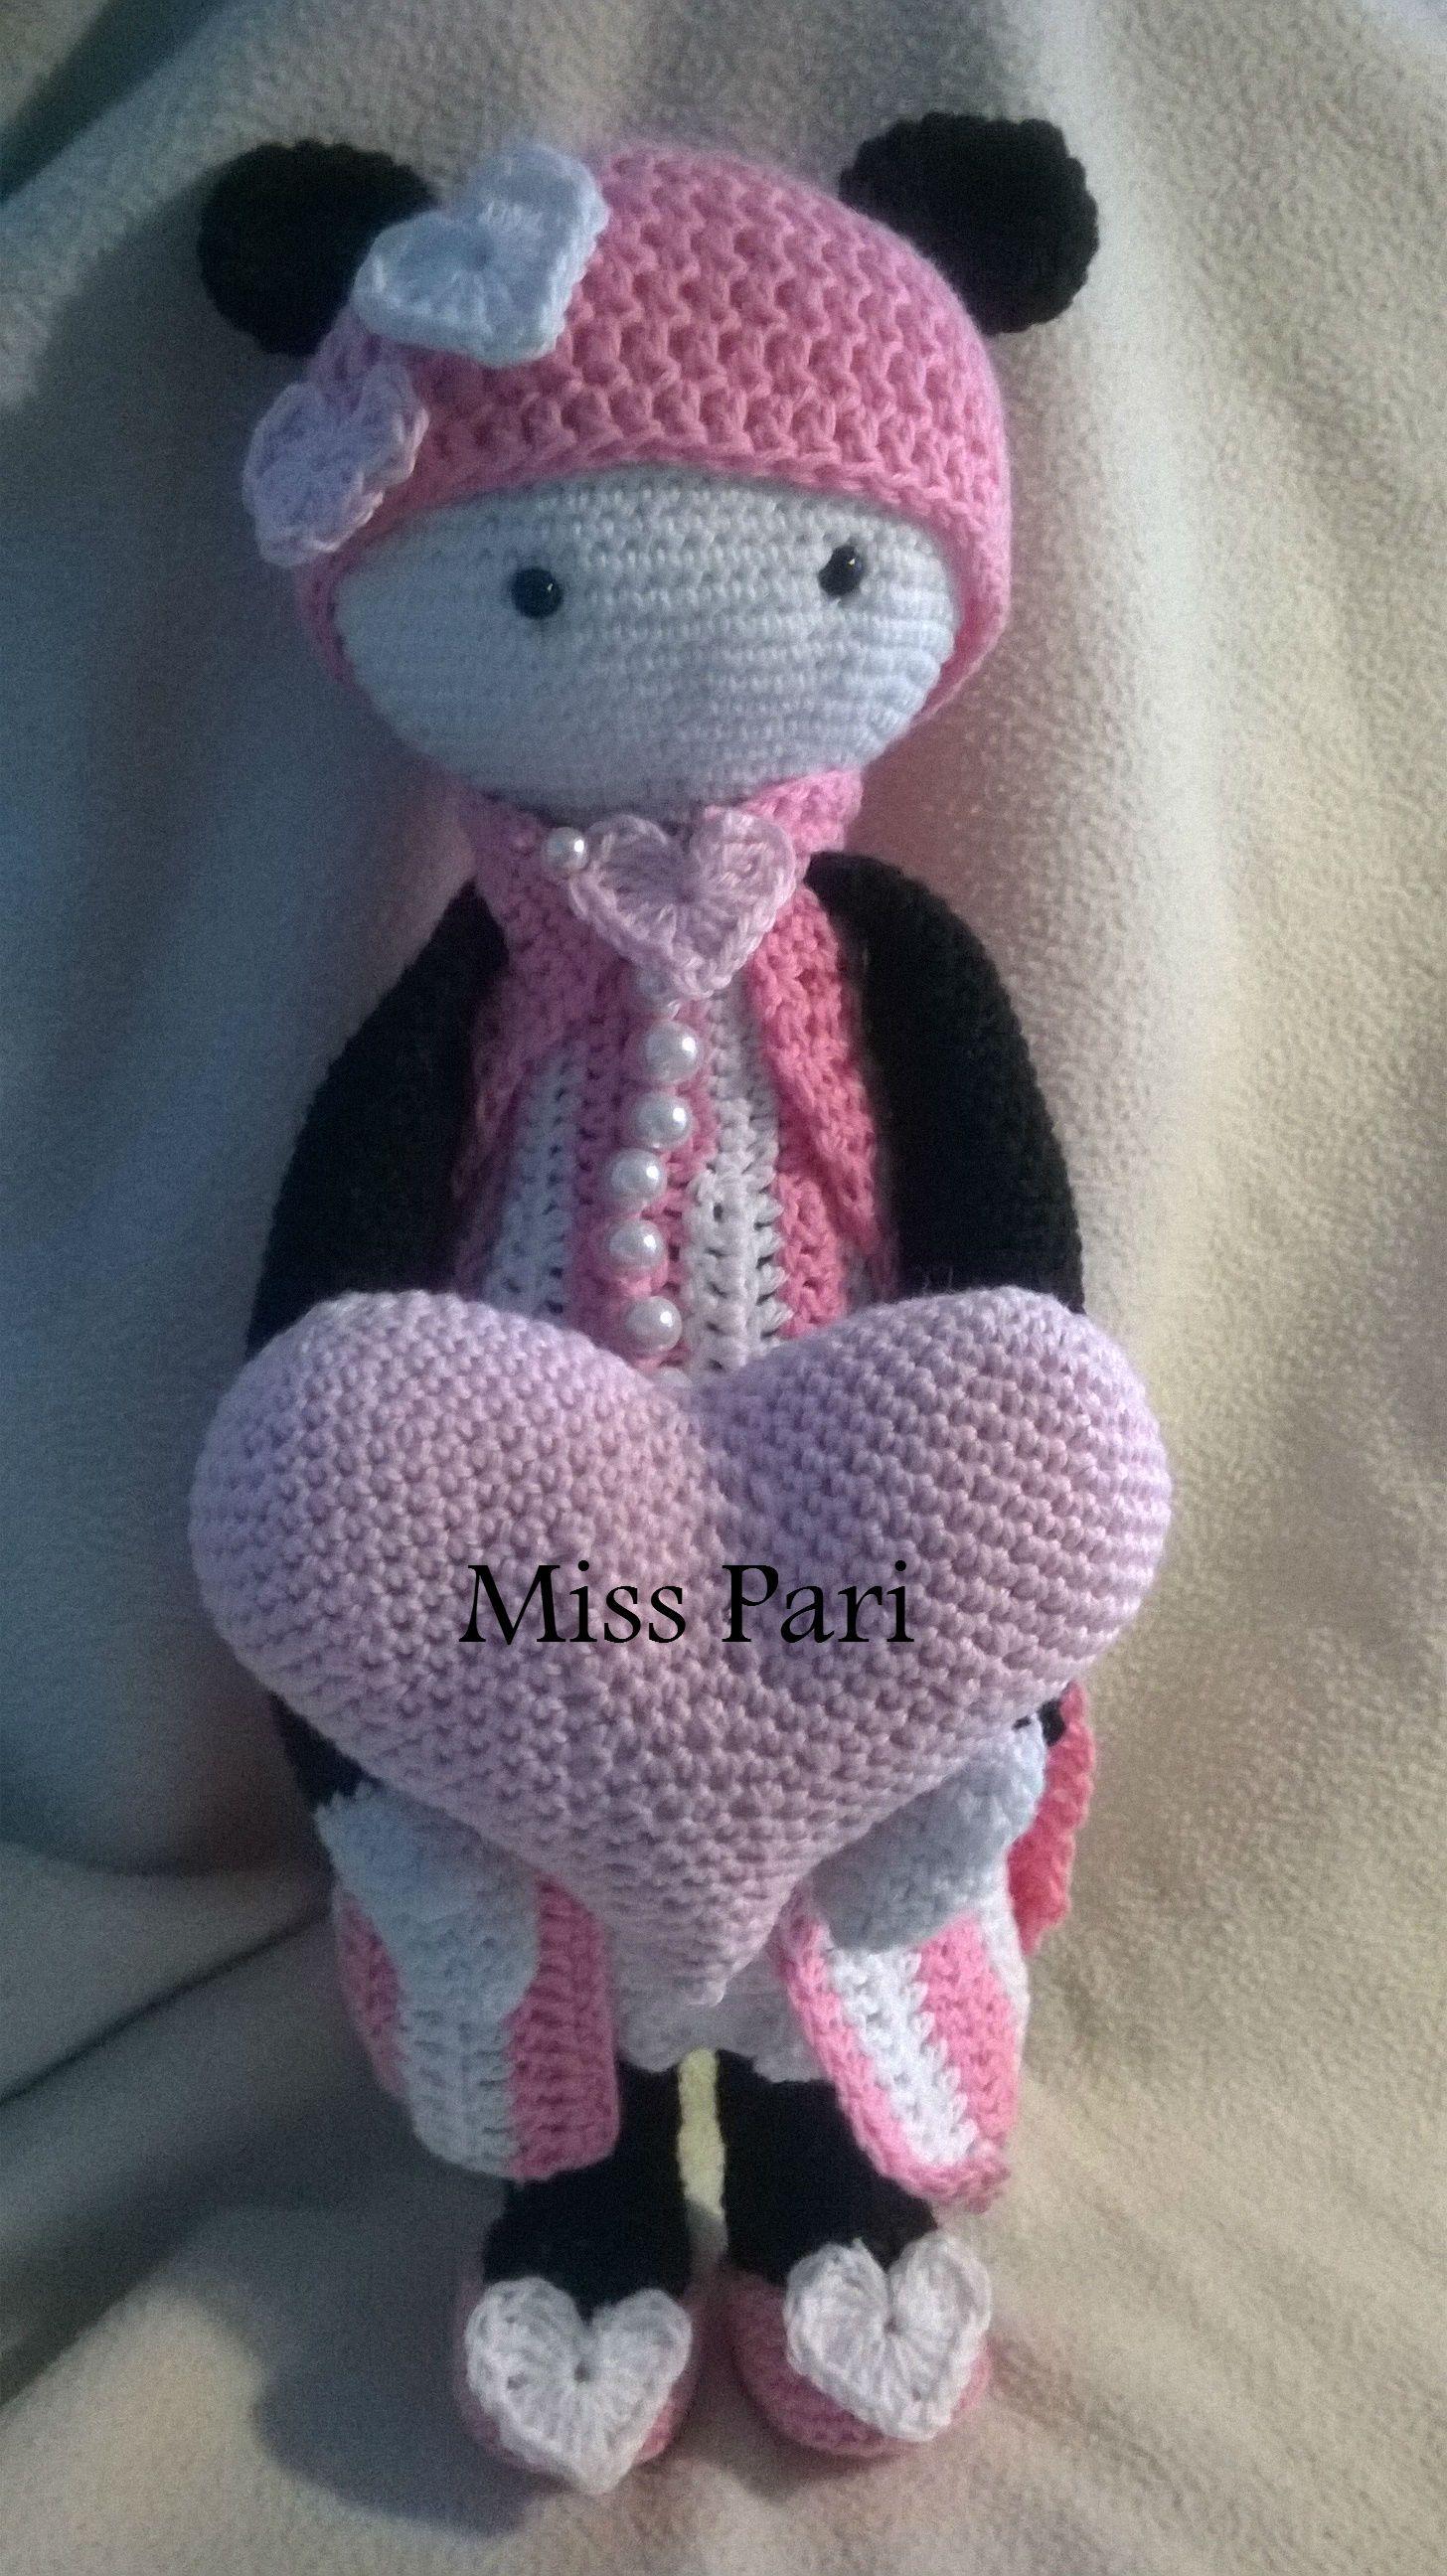 #miss#pari#lalylala#valentines#  https://www.etsy.com/dk-en/shop/missparidesign?ref=hdr_shop_menu